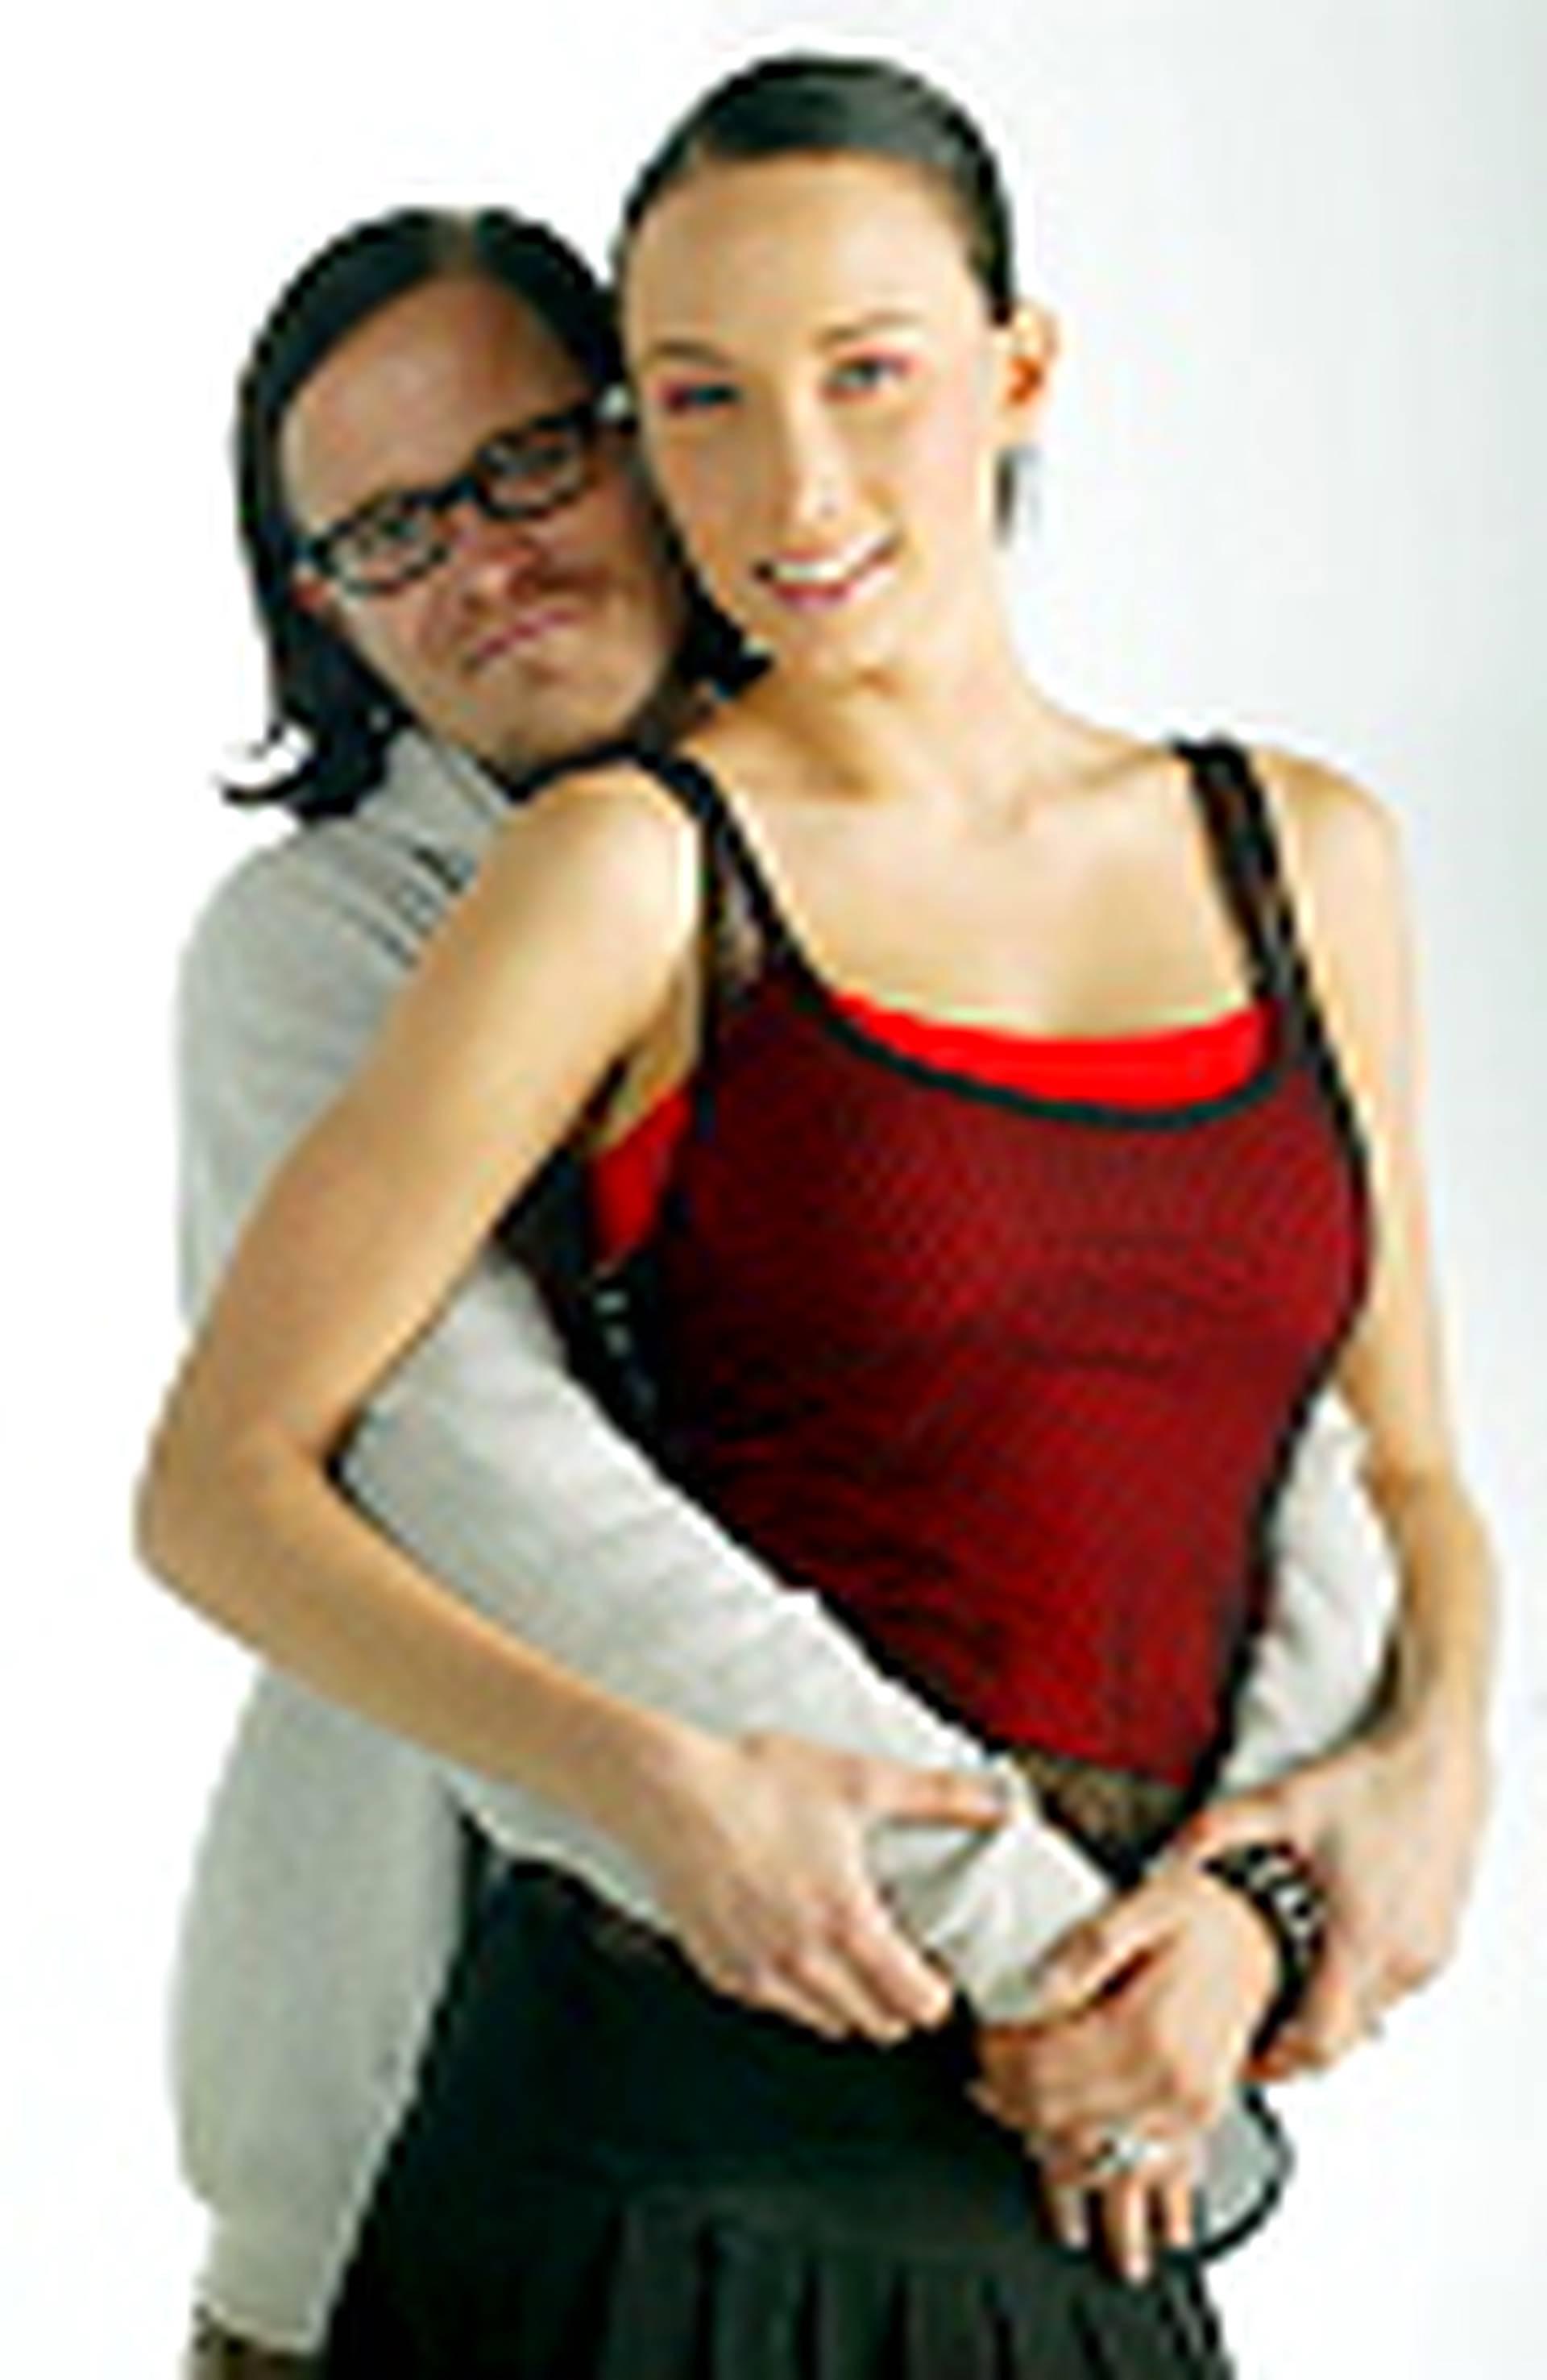 Suuri lesbo dating sites